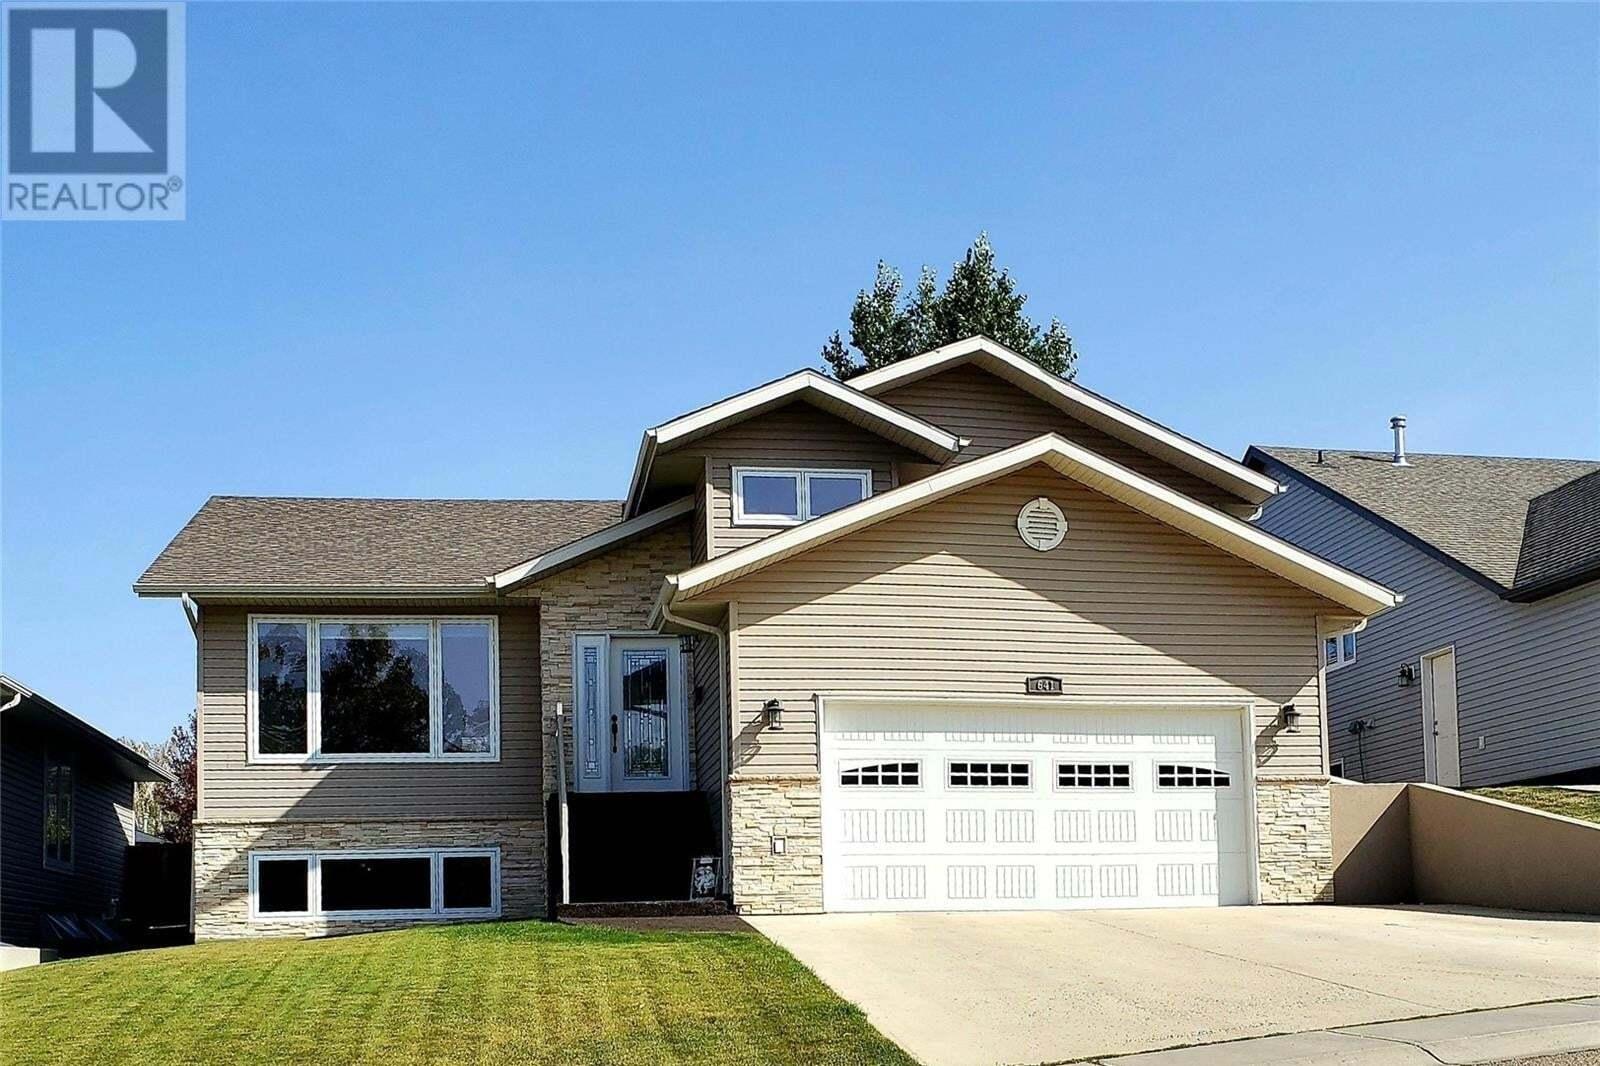 House for sale at 641 4th Ave SE Swift Current Saskatchewan - MLS: SK827108